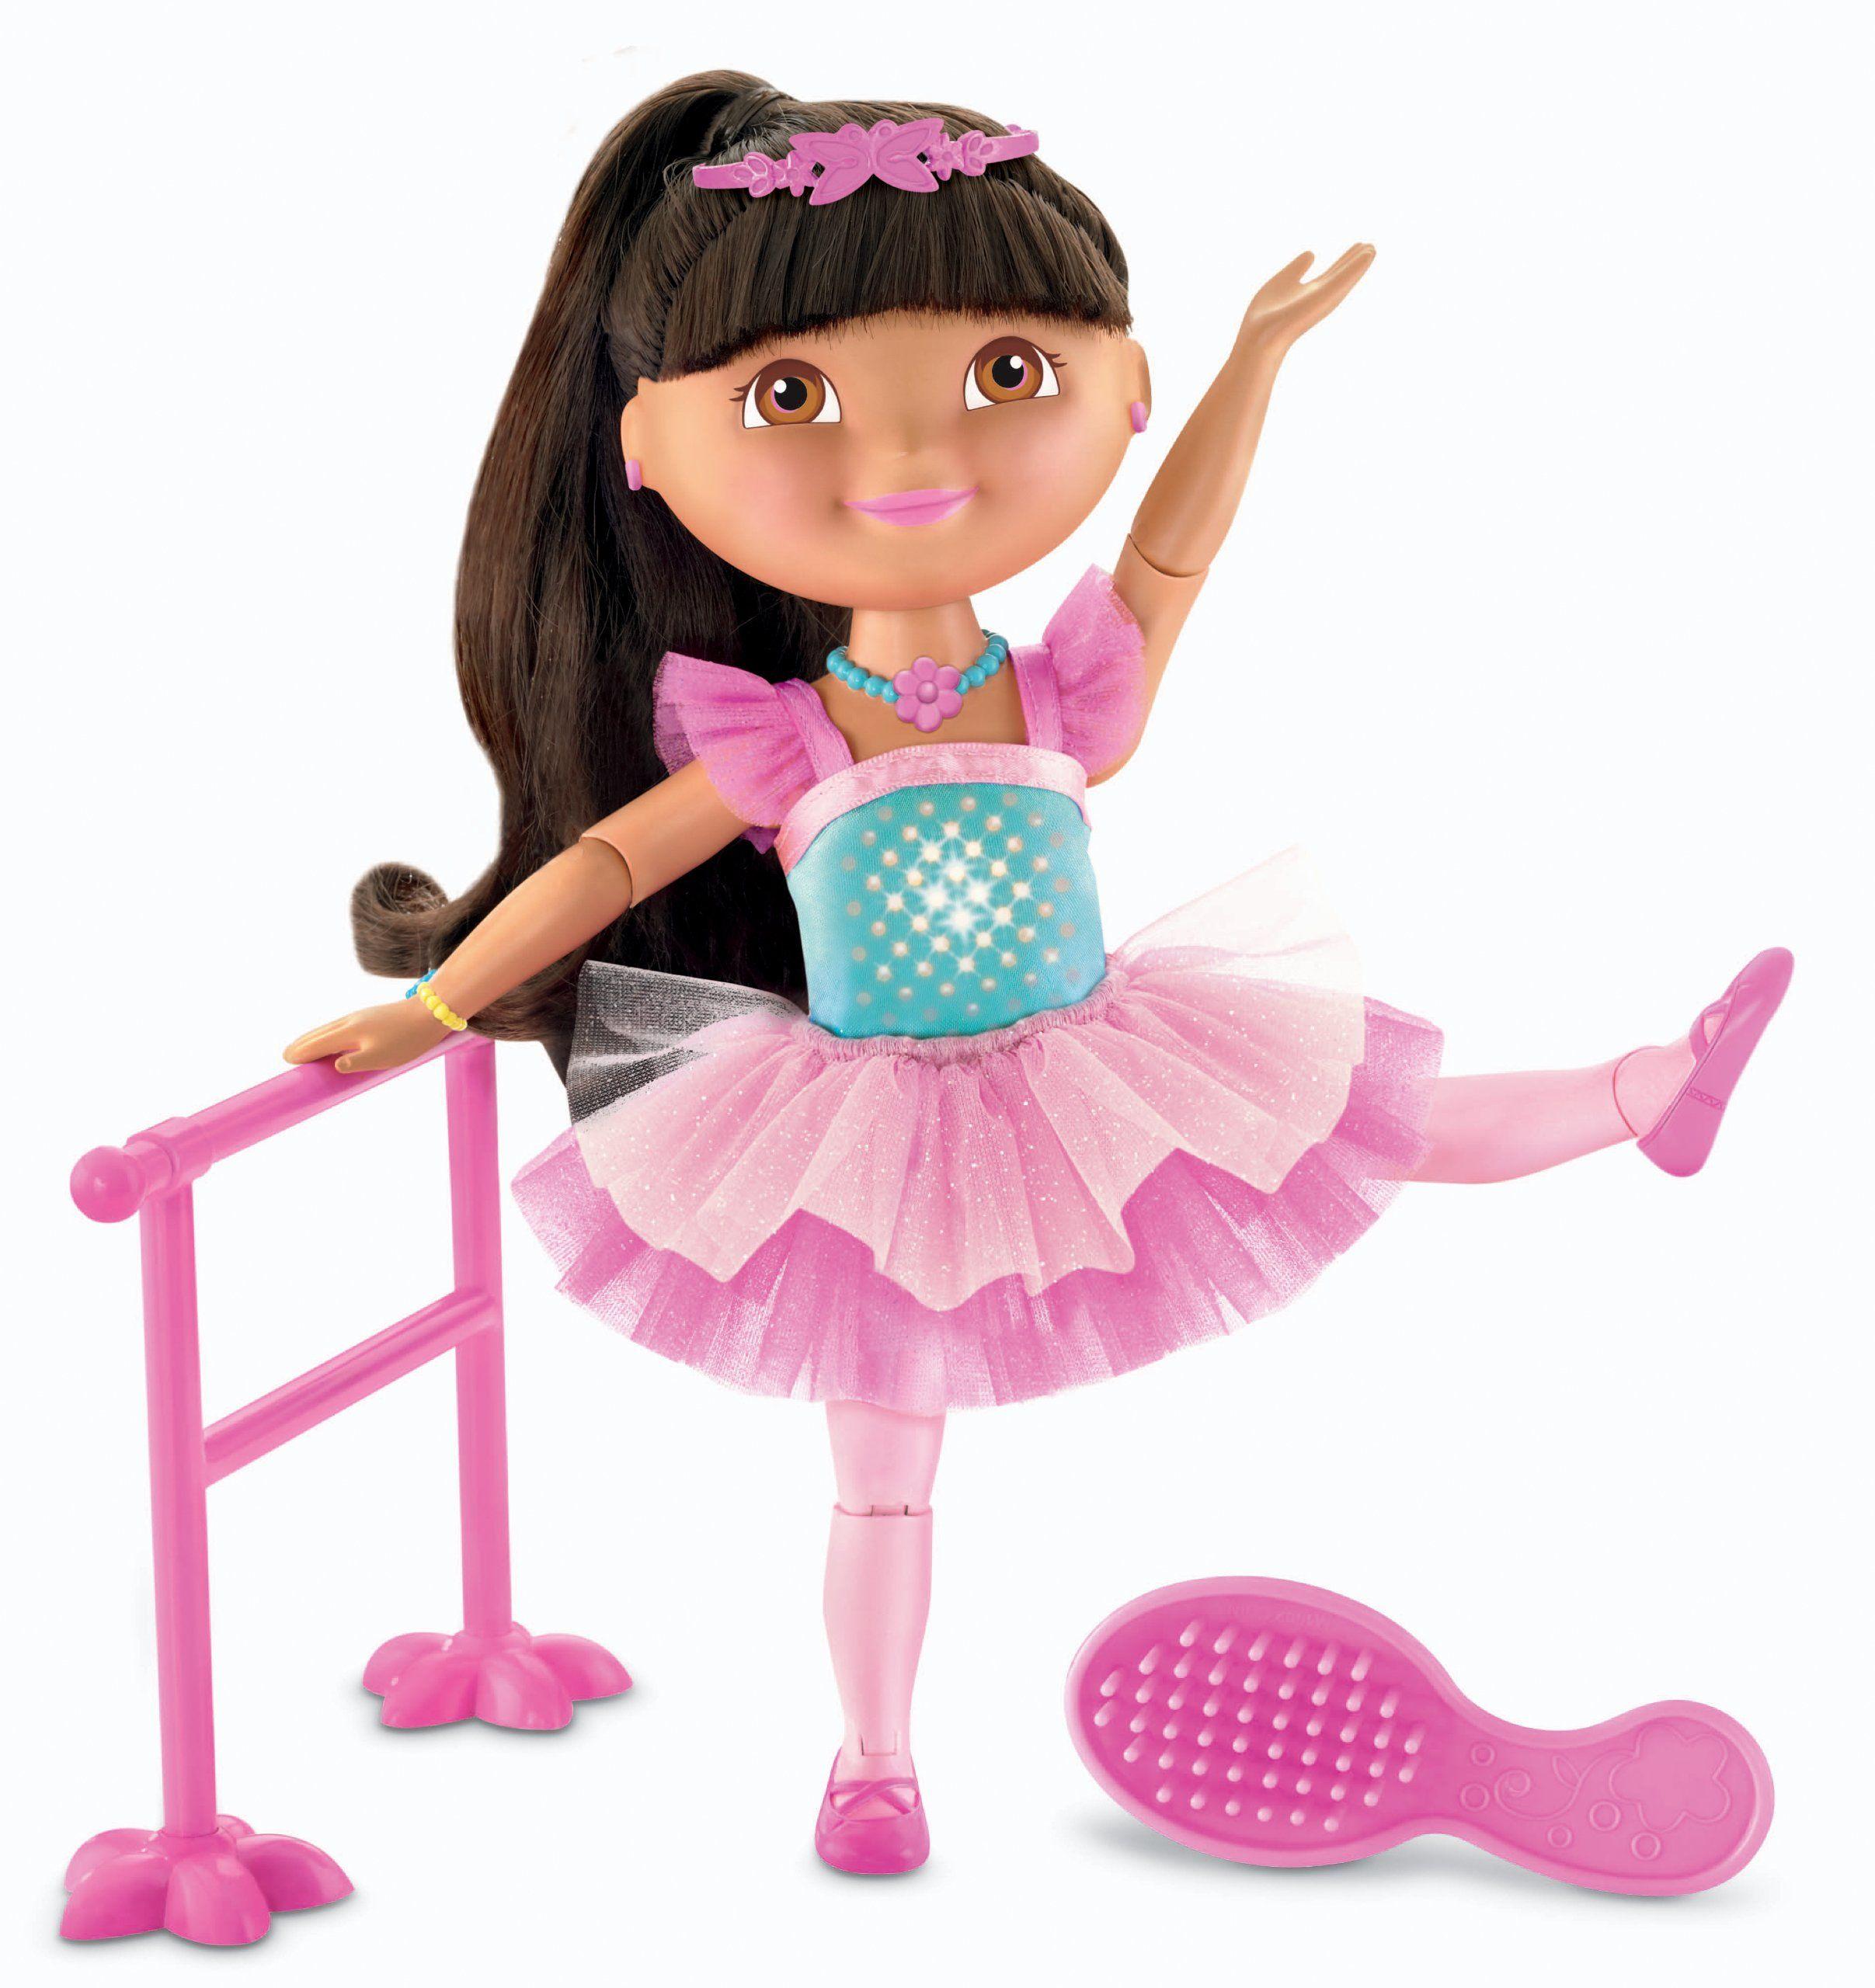 Amazon.com: Fisher-Price Dora The Explorer Dance And